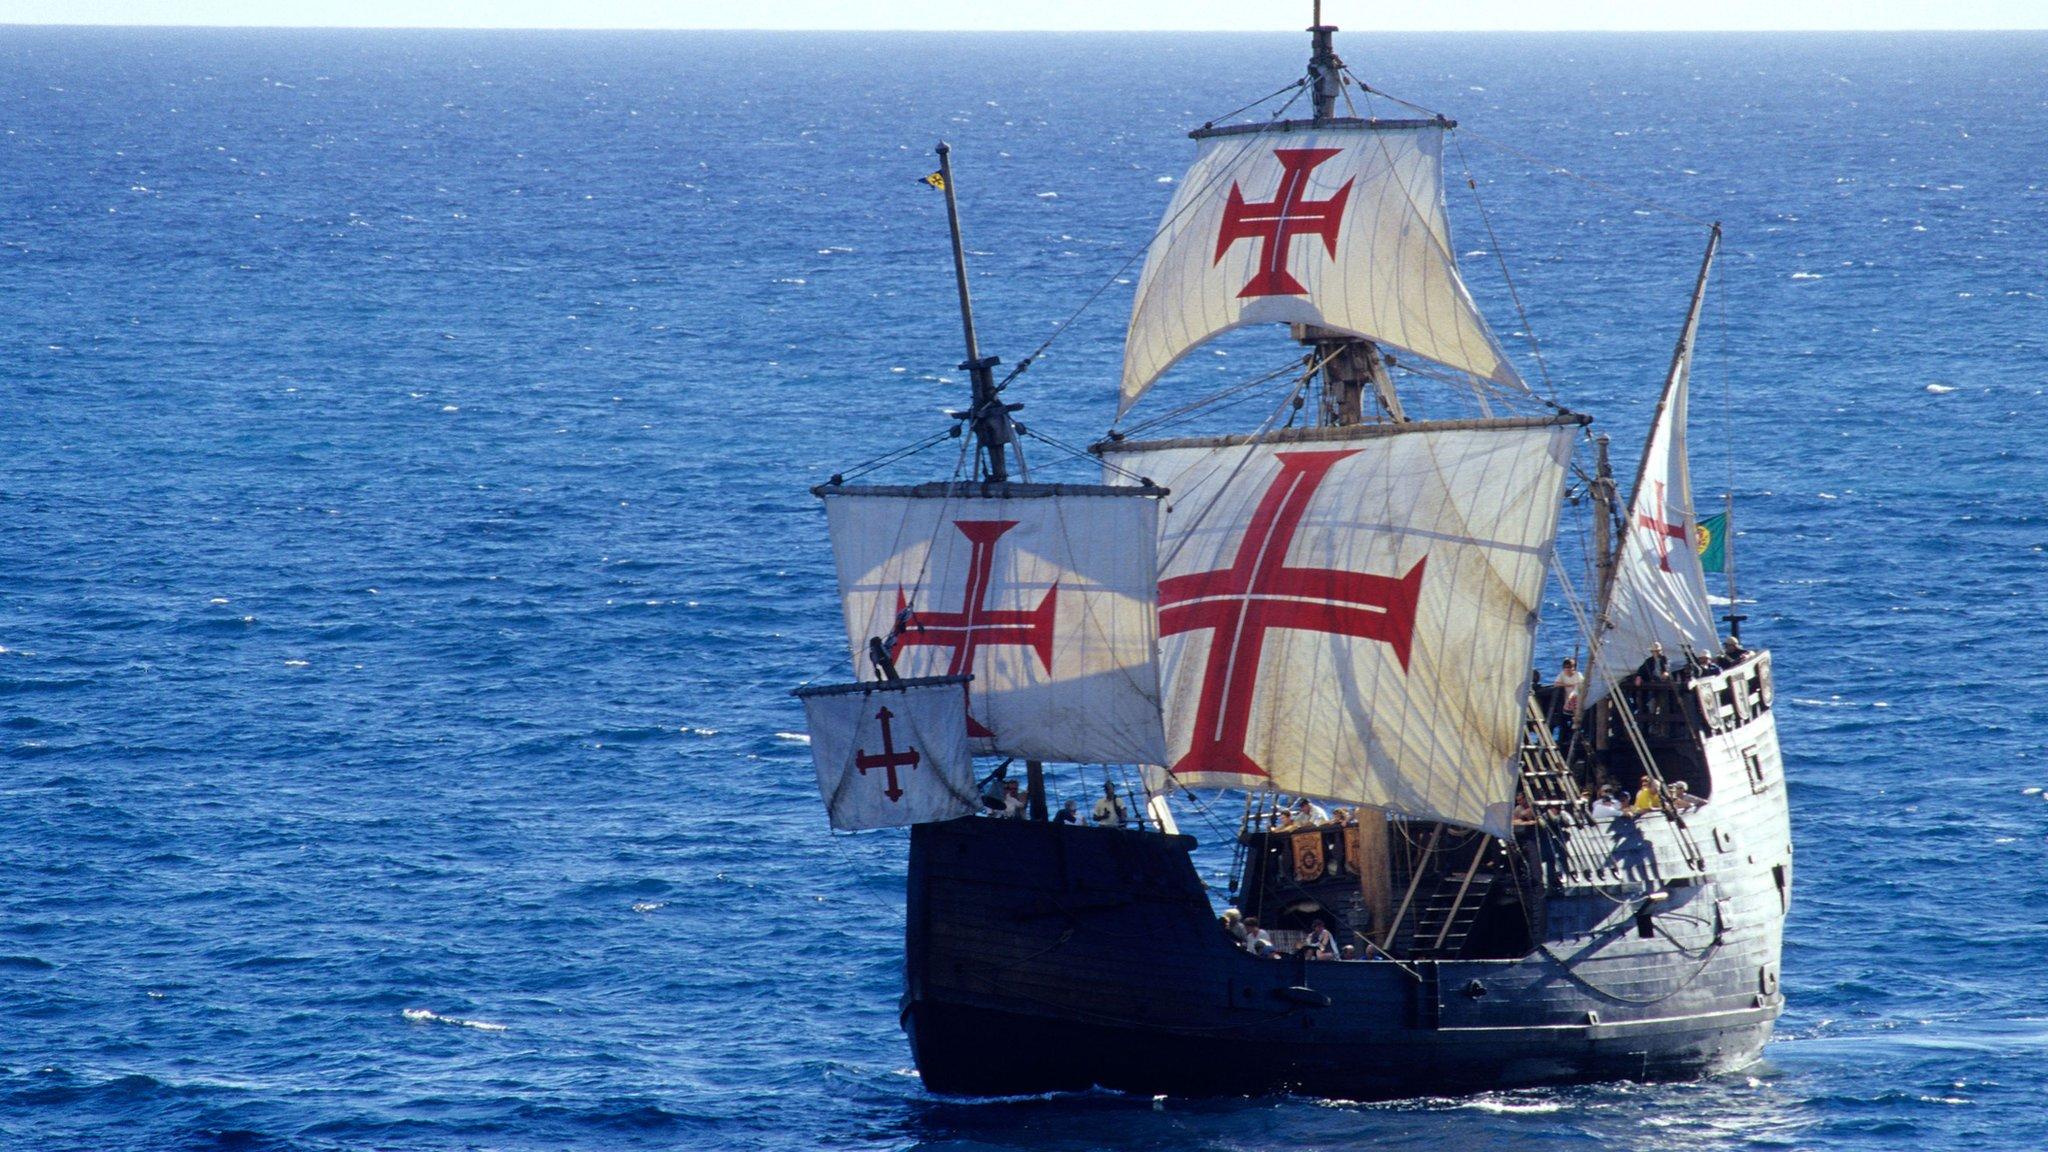 Christopher Columbus's Santa Maria wreck 'found' - CBBC ...